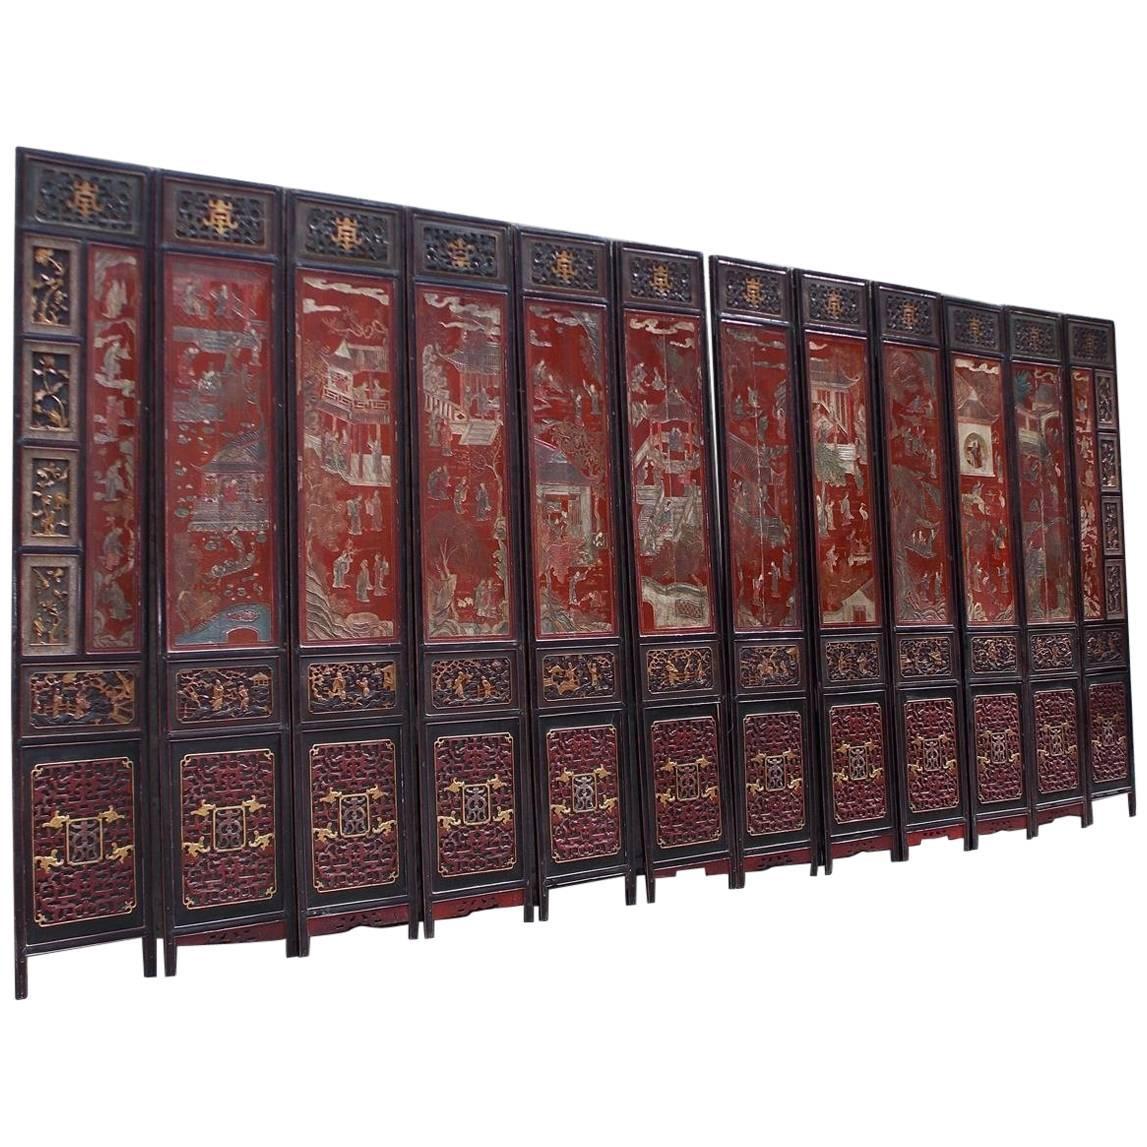 Chinese Coromandel Red Lacquer 12-Panel Figural and Landscape Screen. Circa 1840